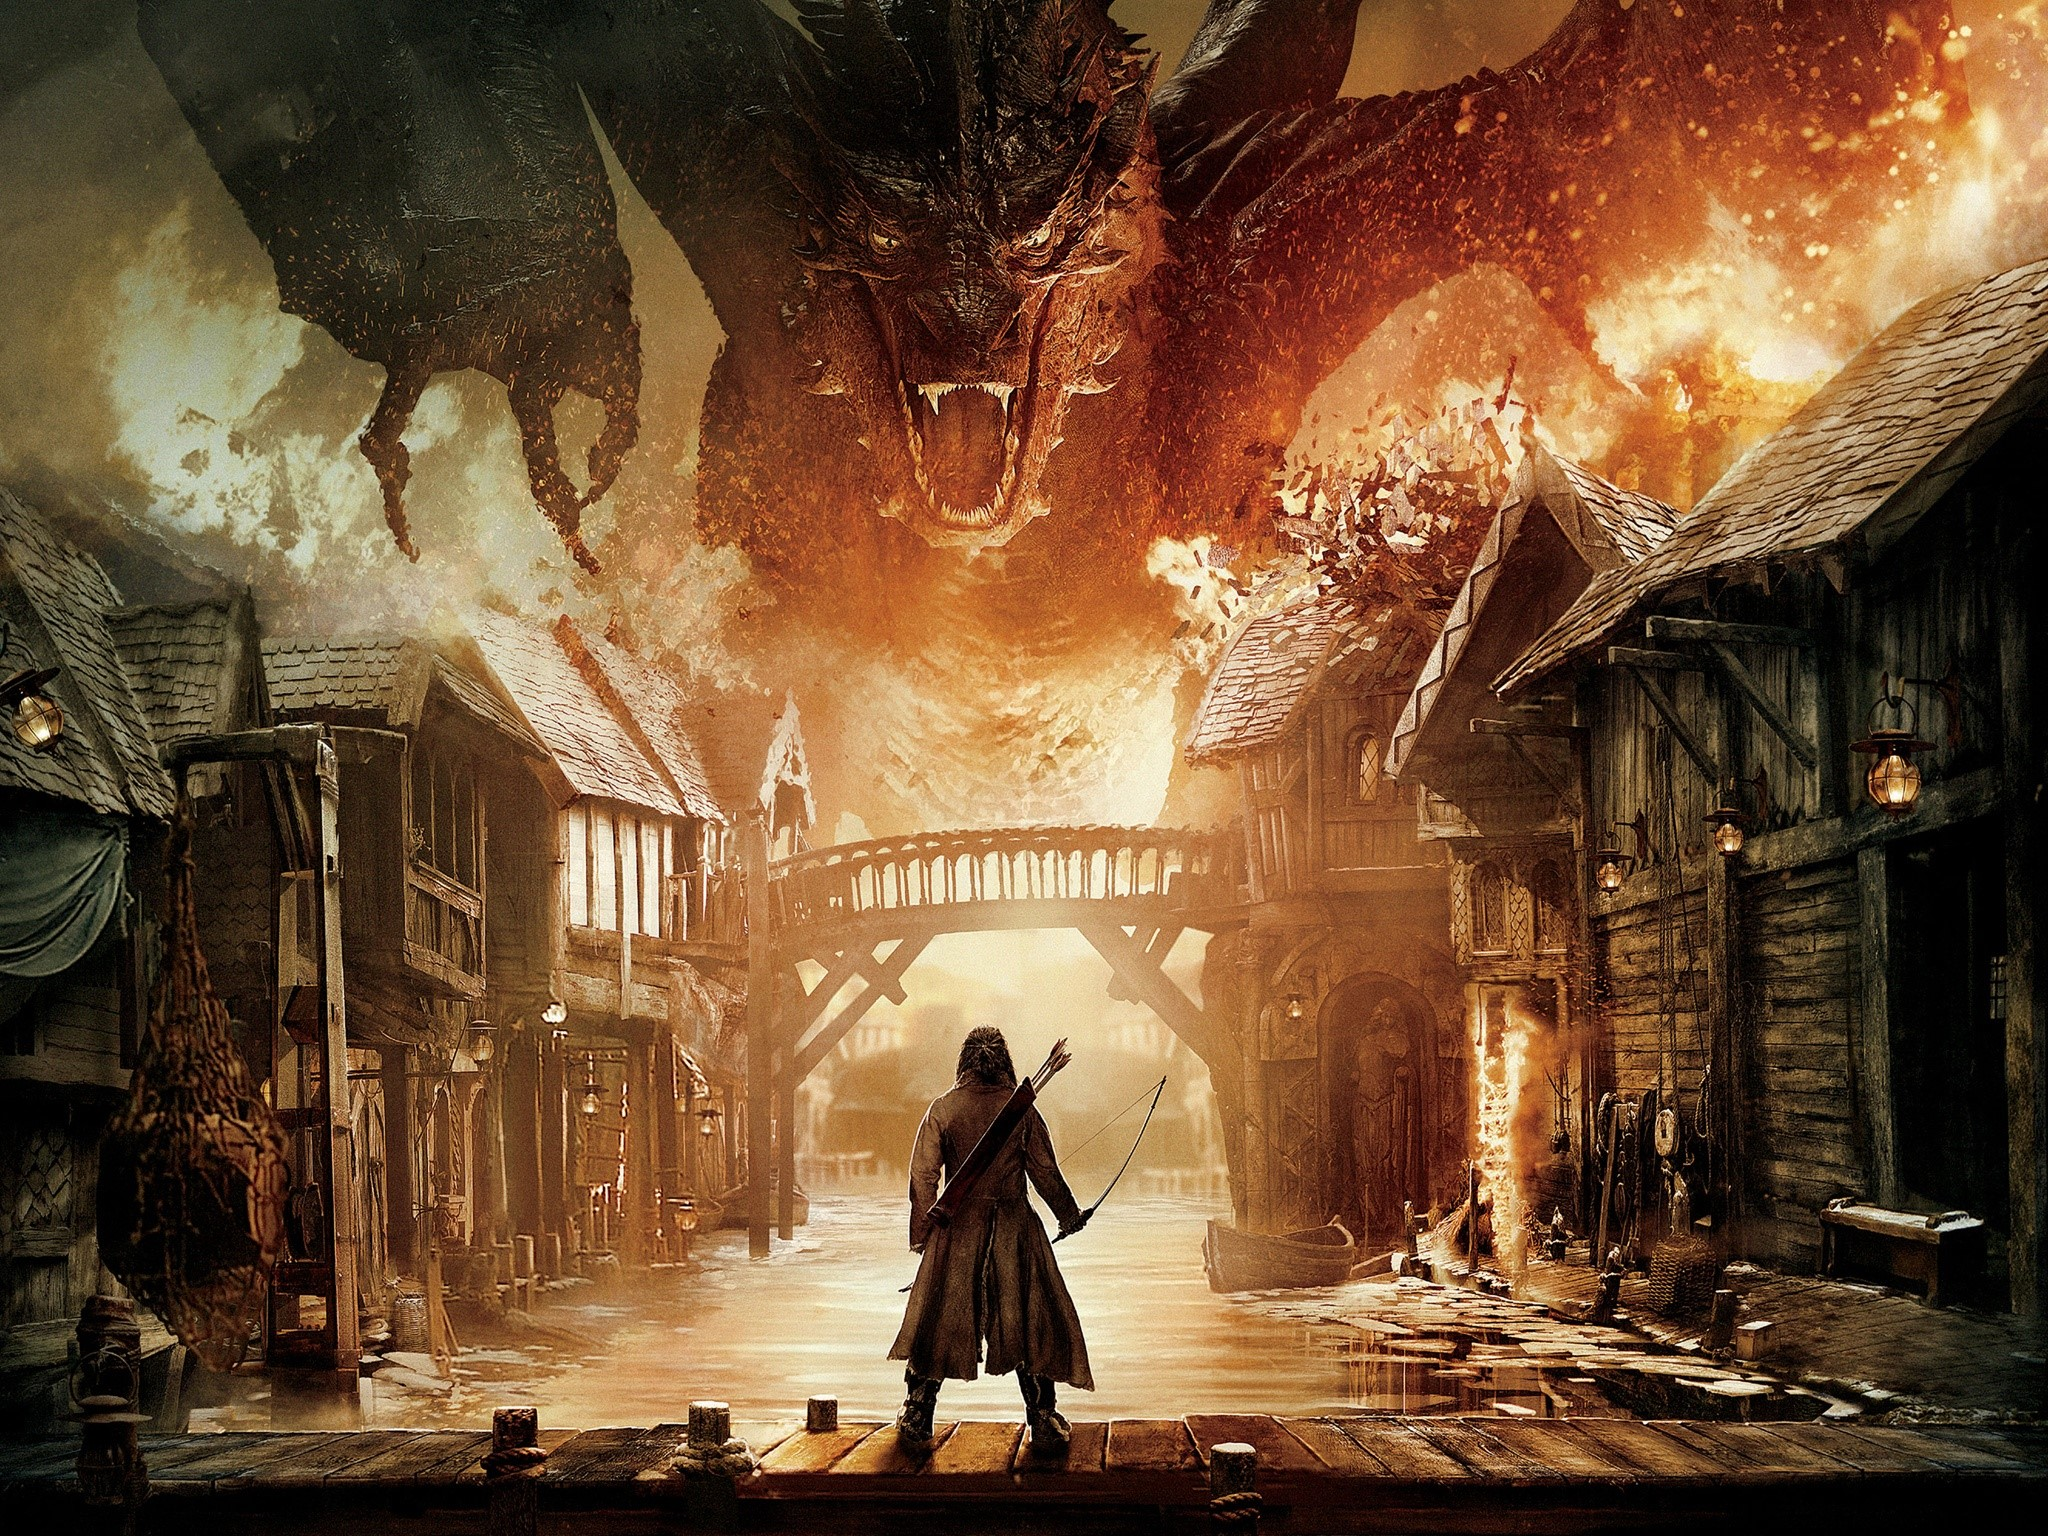 Fondos de pantalla The hobbit The battle of the five armies